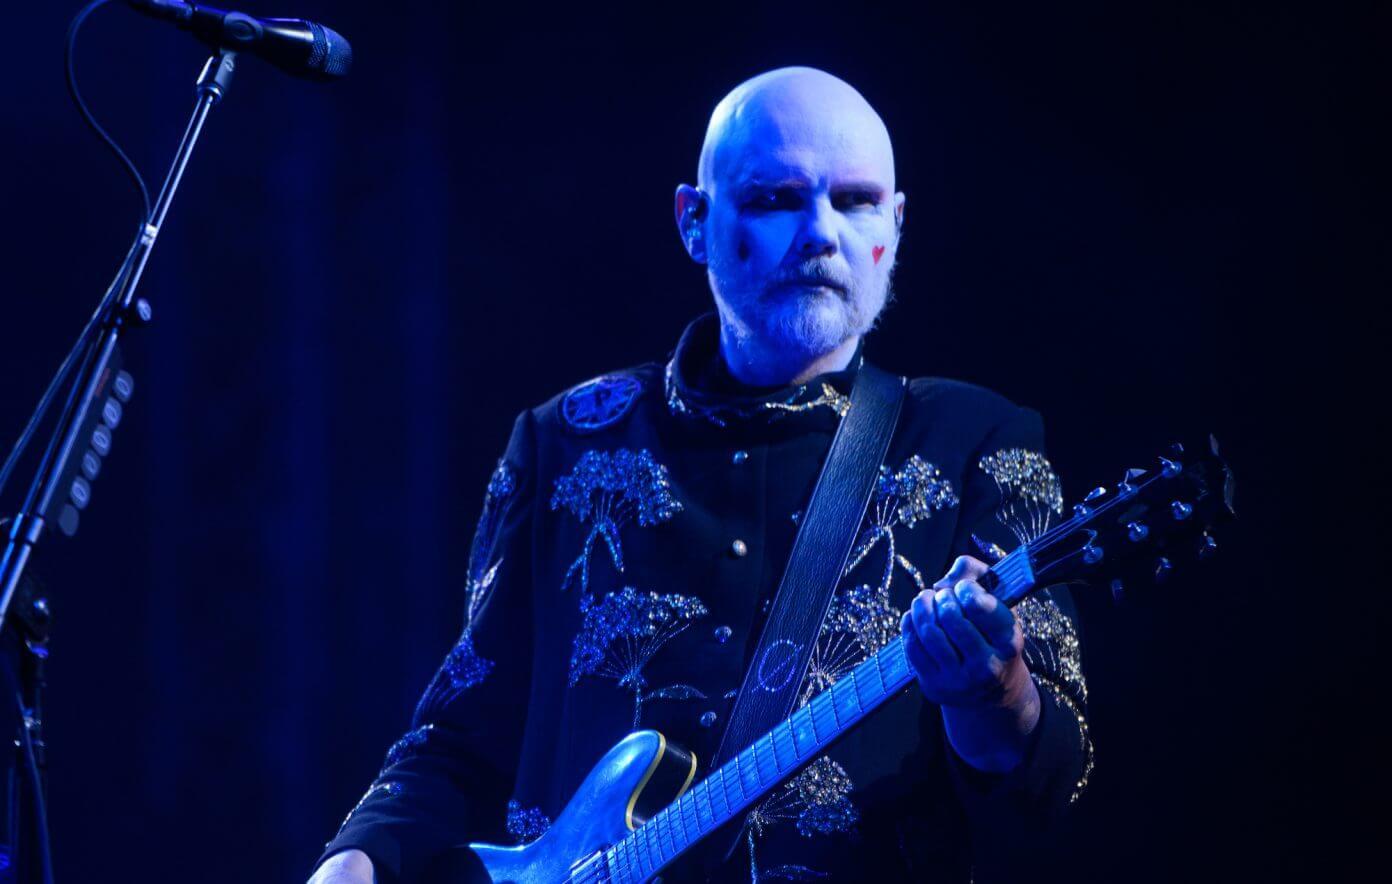 Watch Billy Corgan perform pre-Smashing Pumpkins songs and rarities